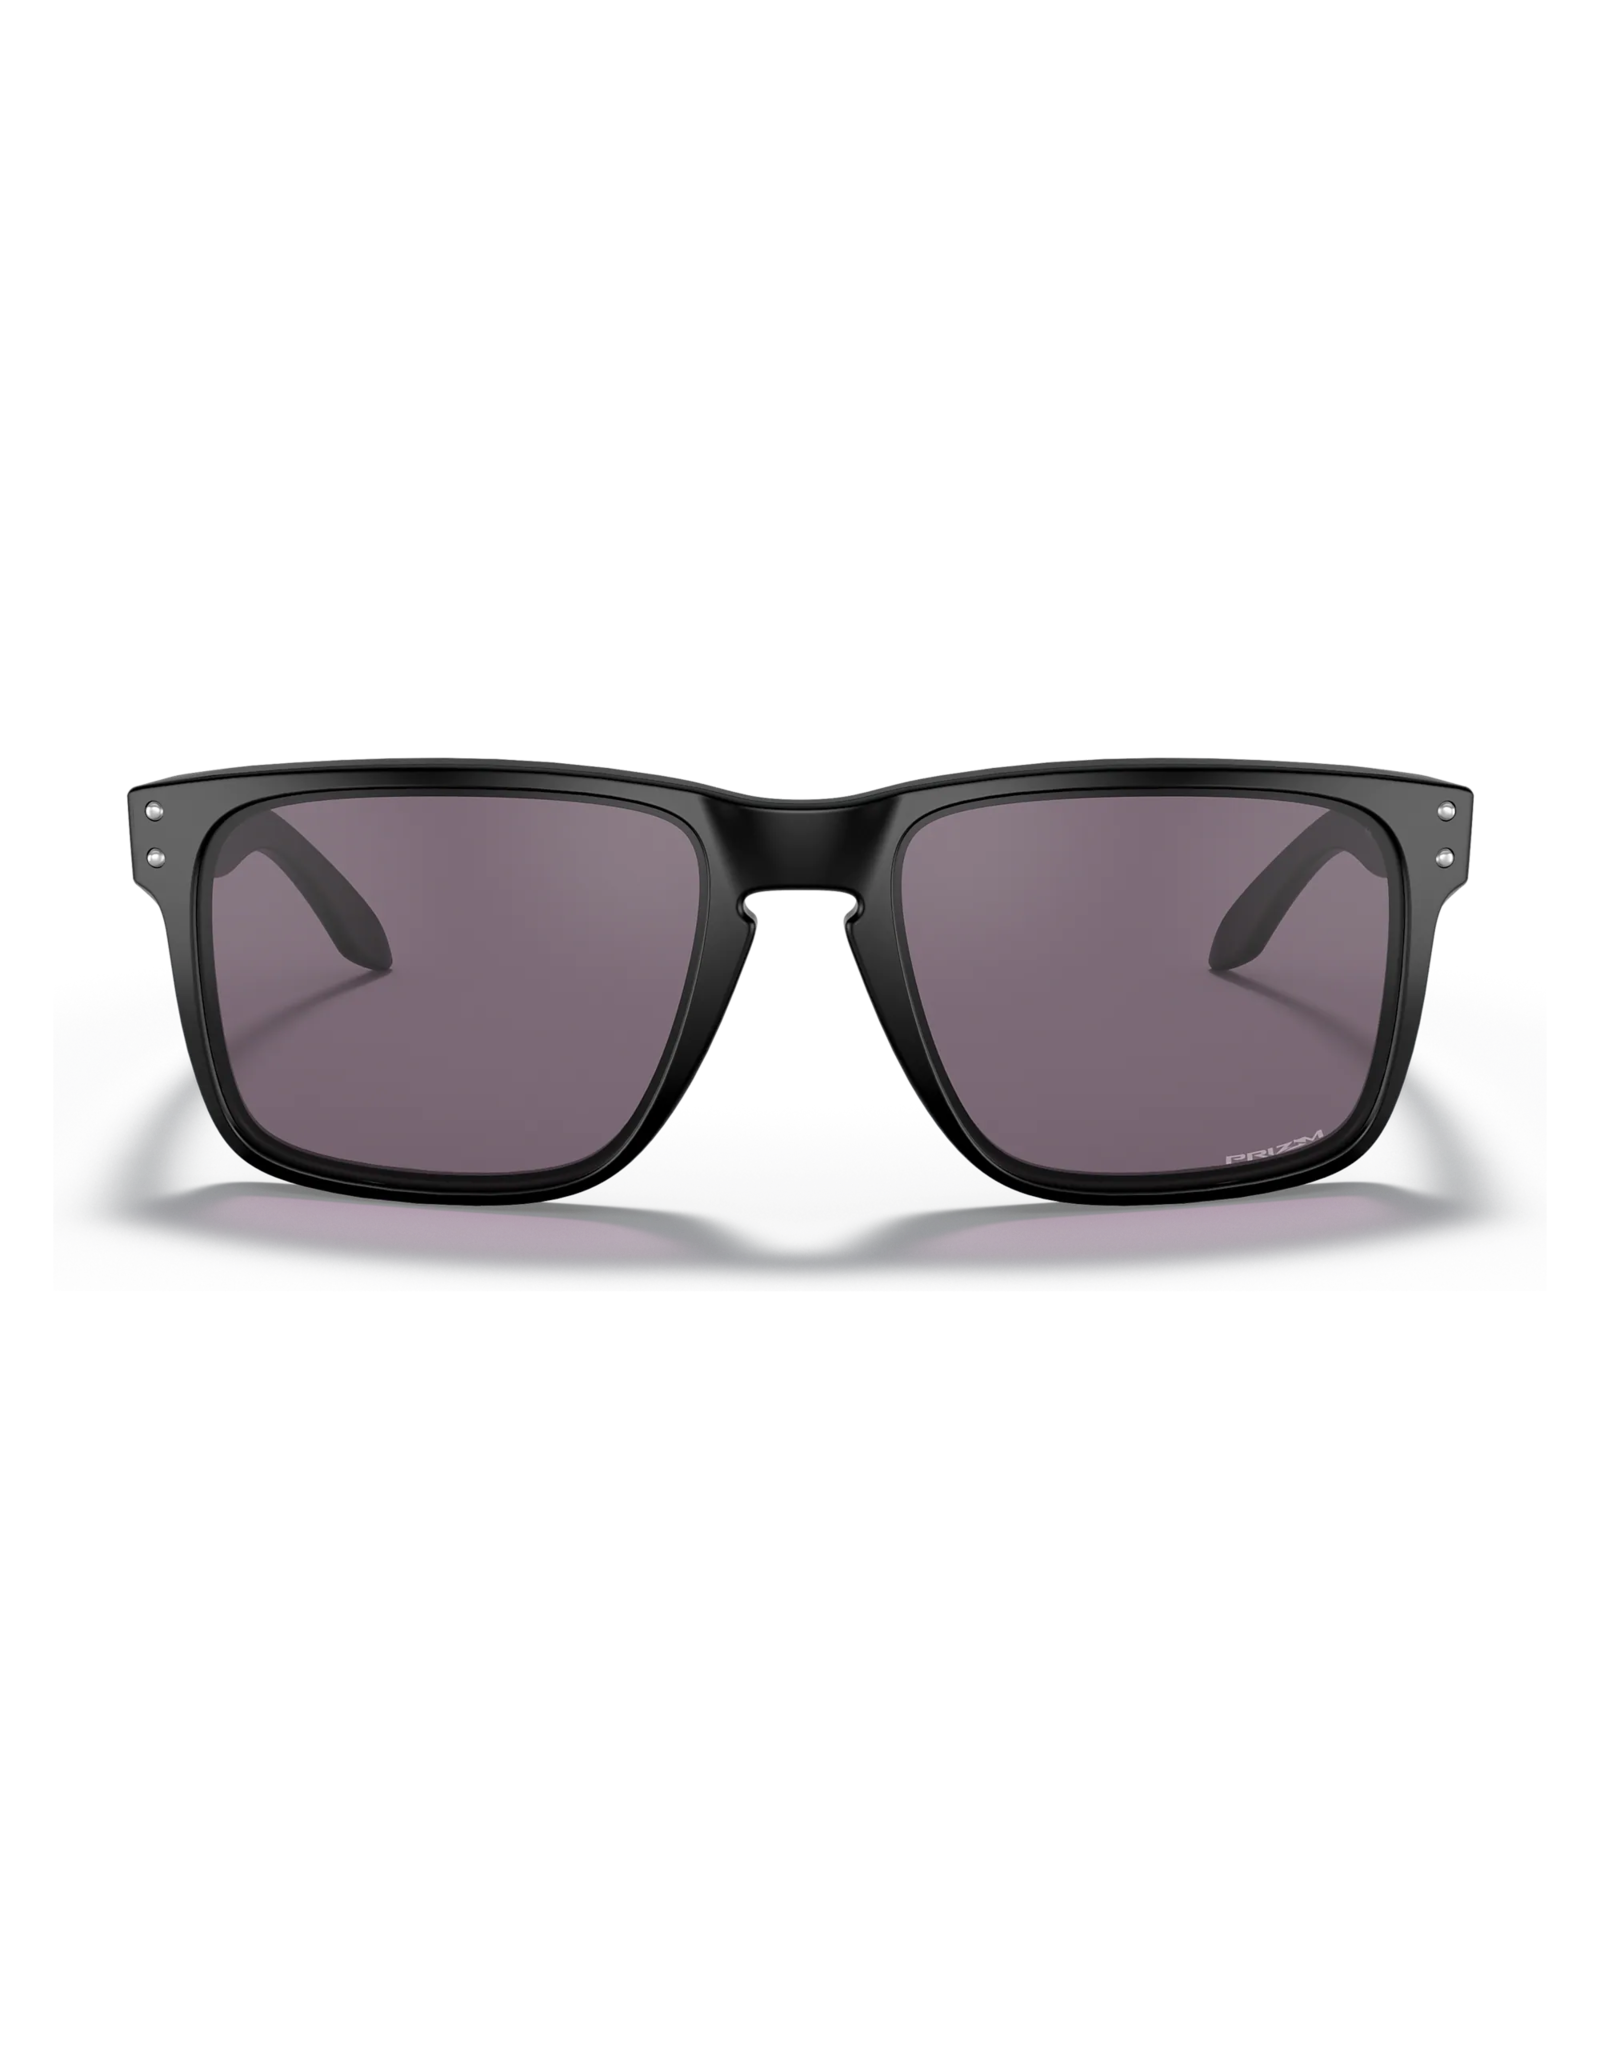 OAKLEY oakley Holbrook XL matte black prizm grey sunglasses